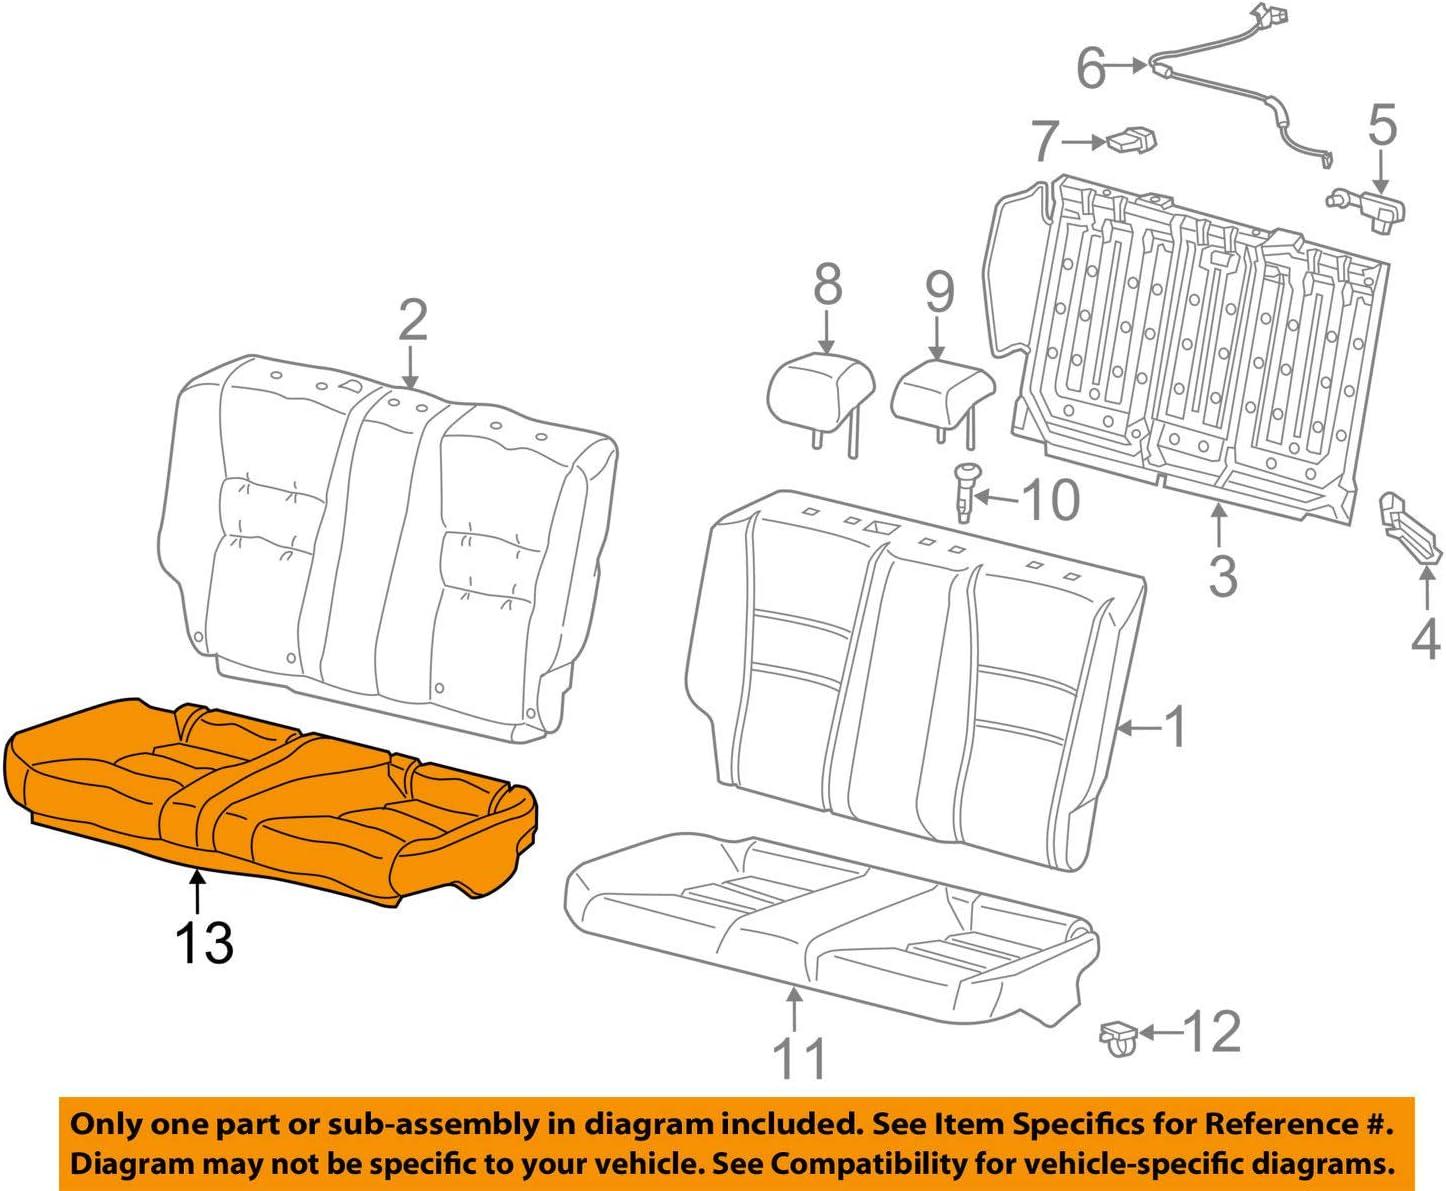 Honda supreme Genuine 82131-T3L-A21ZB Seat Cover Rear Cushion Trim Gifts